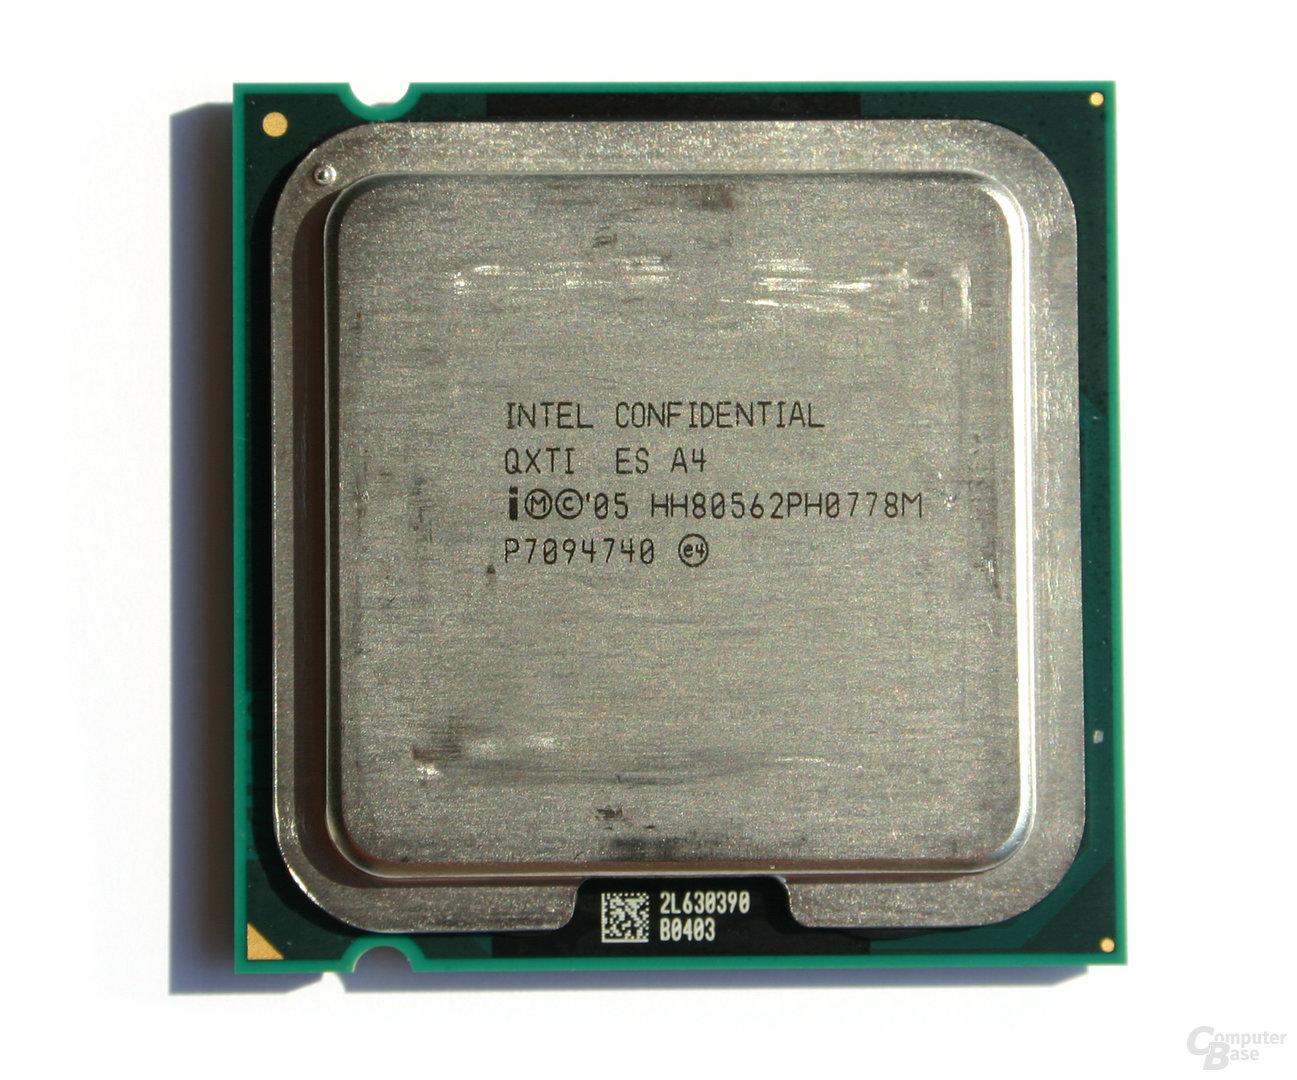 Intel Core 2 Extreme QX6800 (Draufsicht)